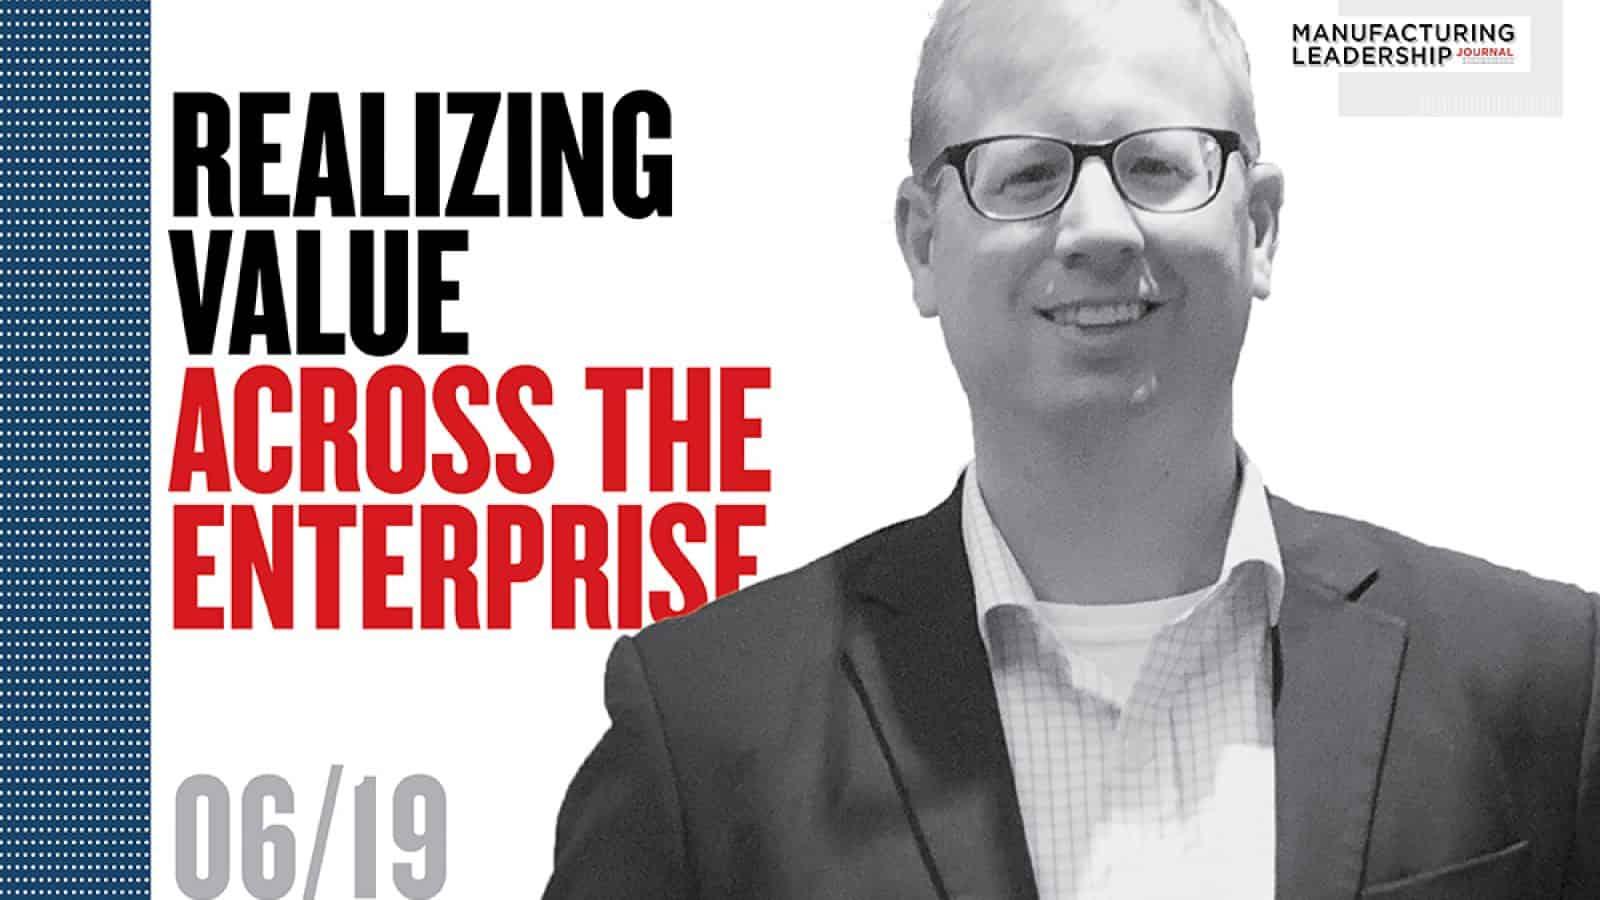 Realizing Value Across the Enterprise